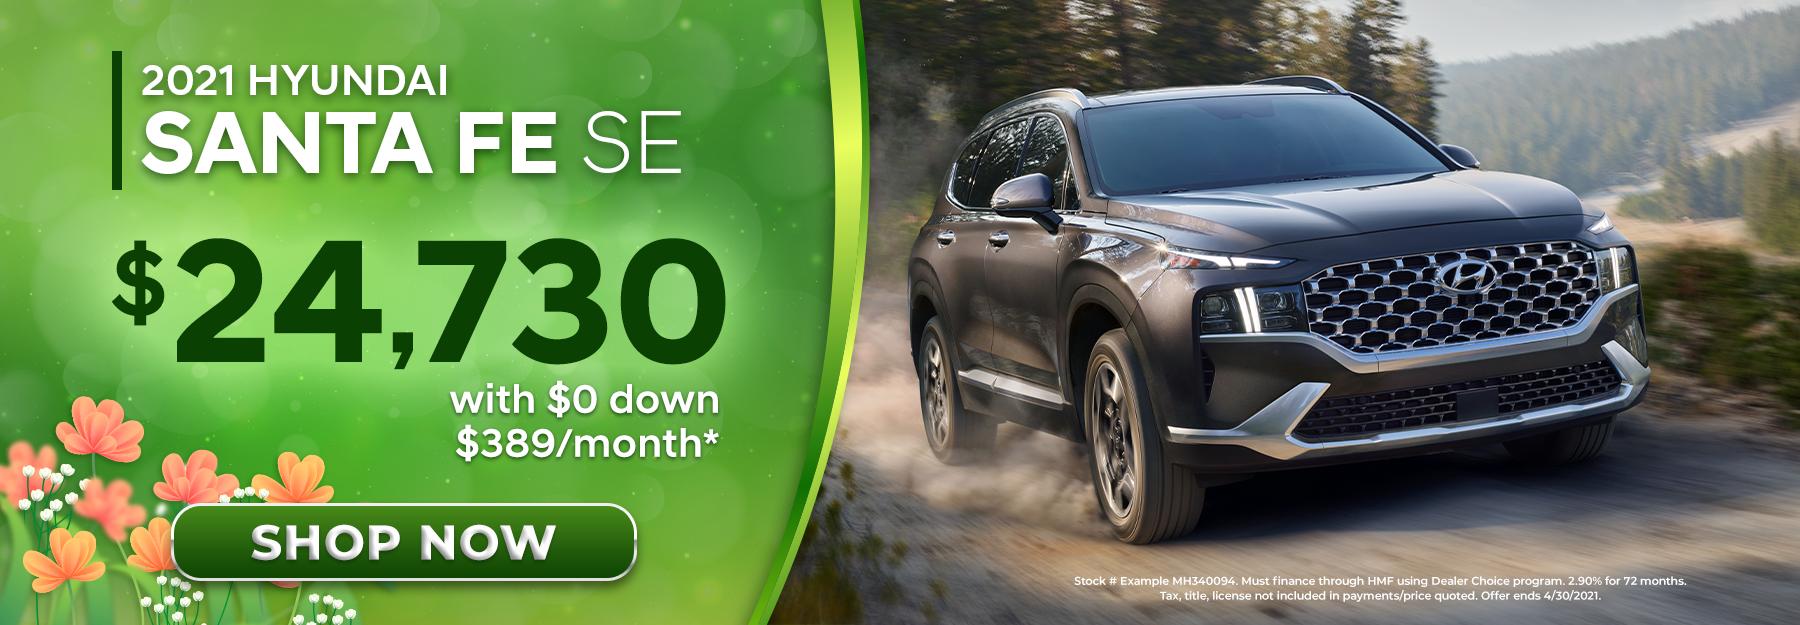 2021 Hyundai Santa Fe SE, $24,730, With $0 Down, $389/Month